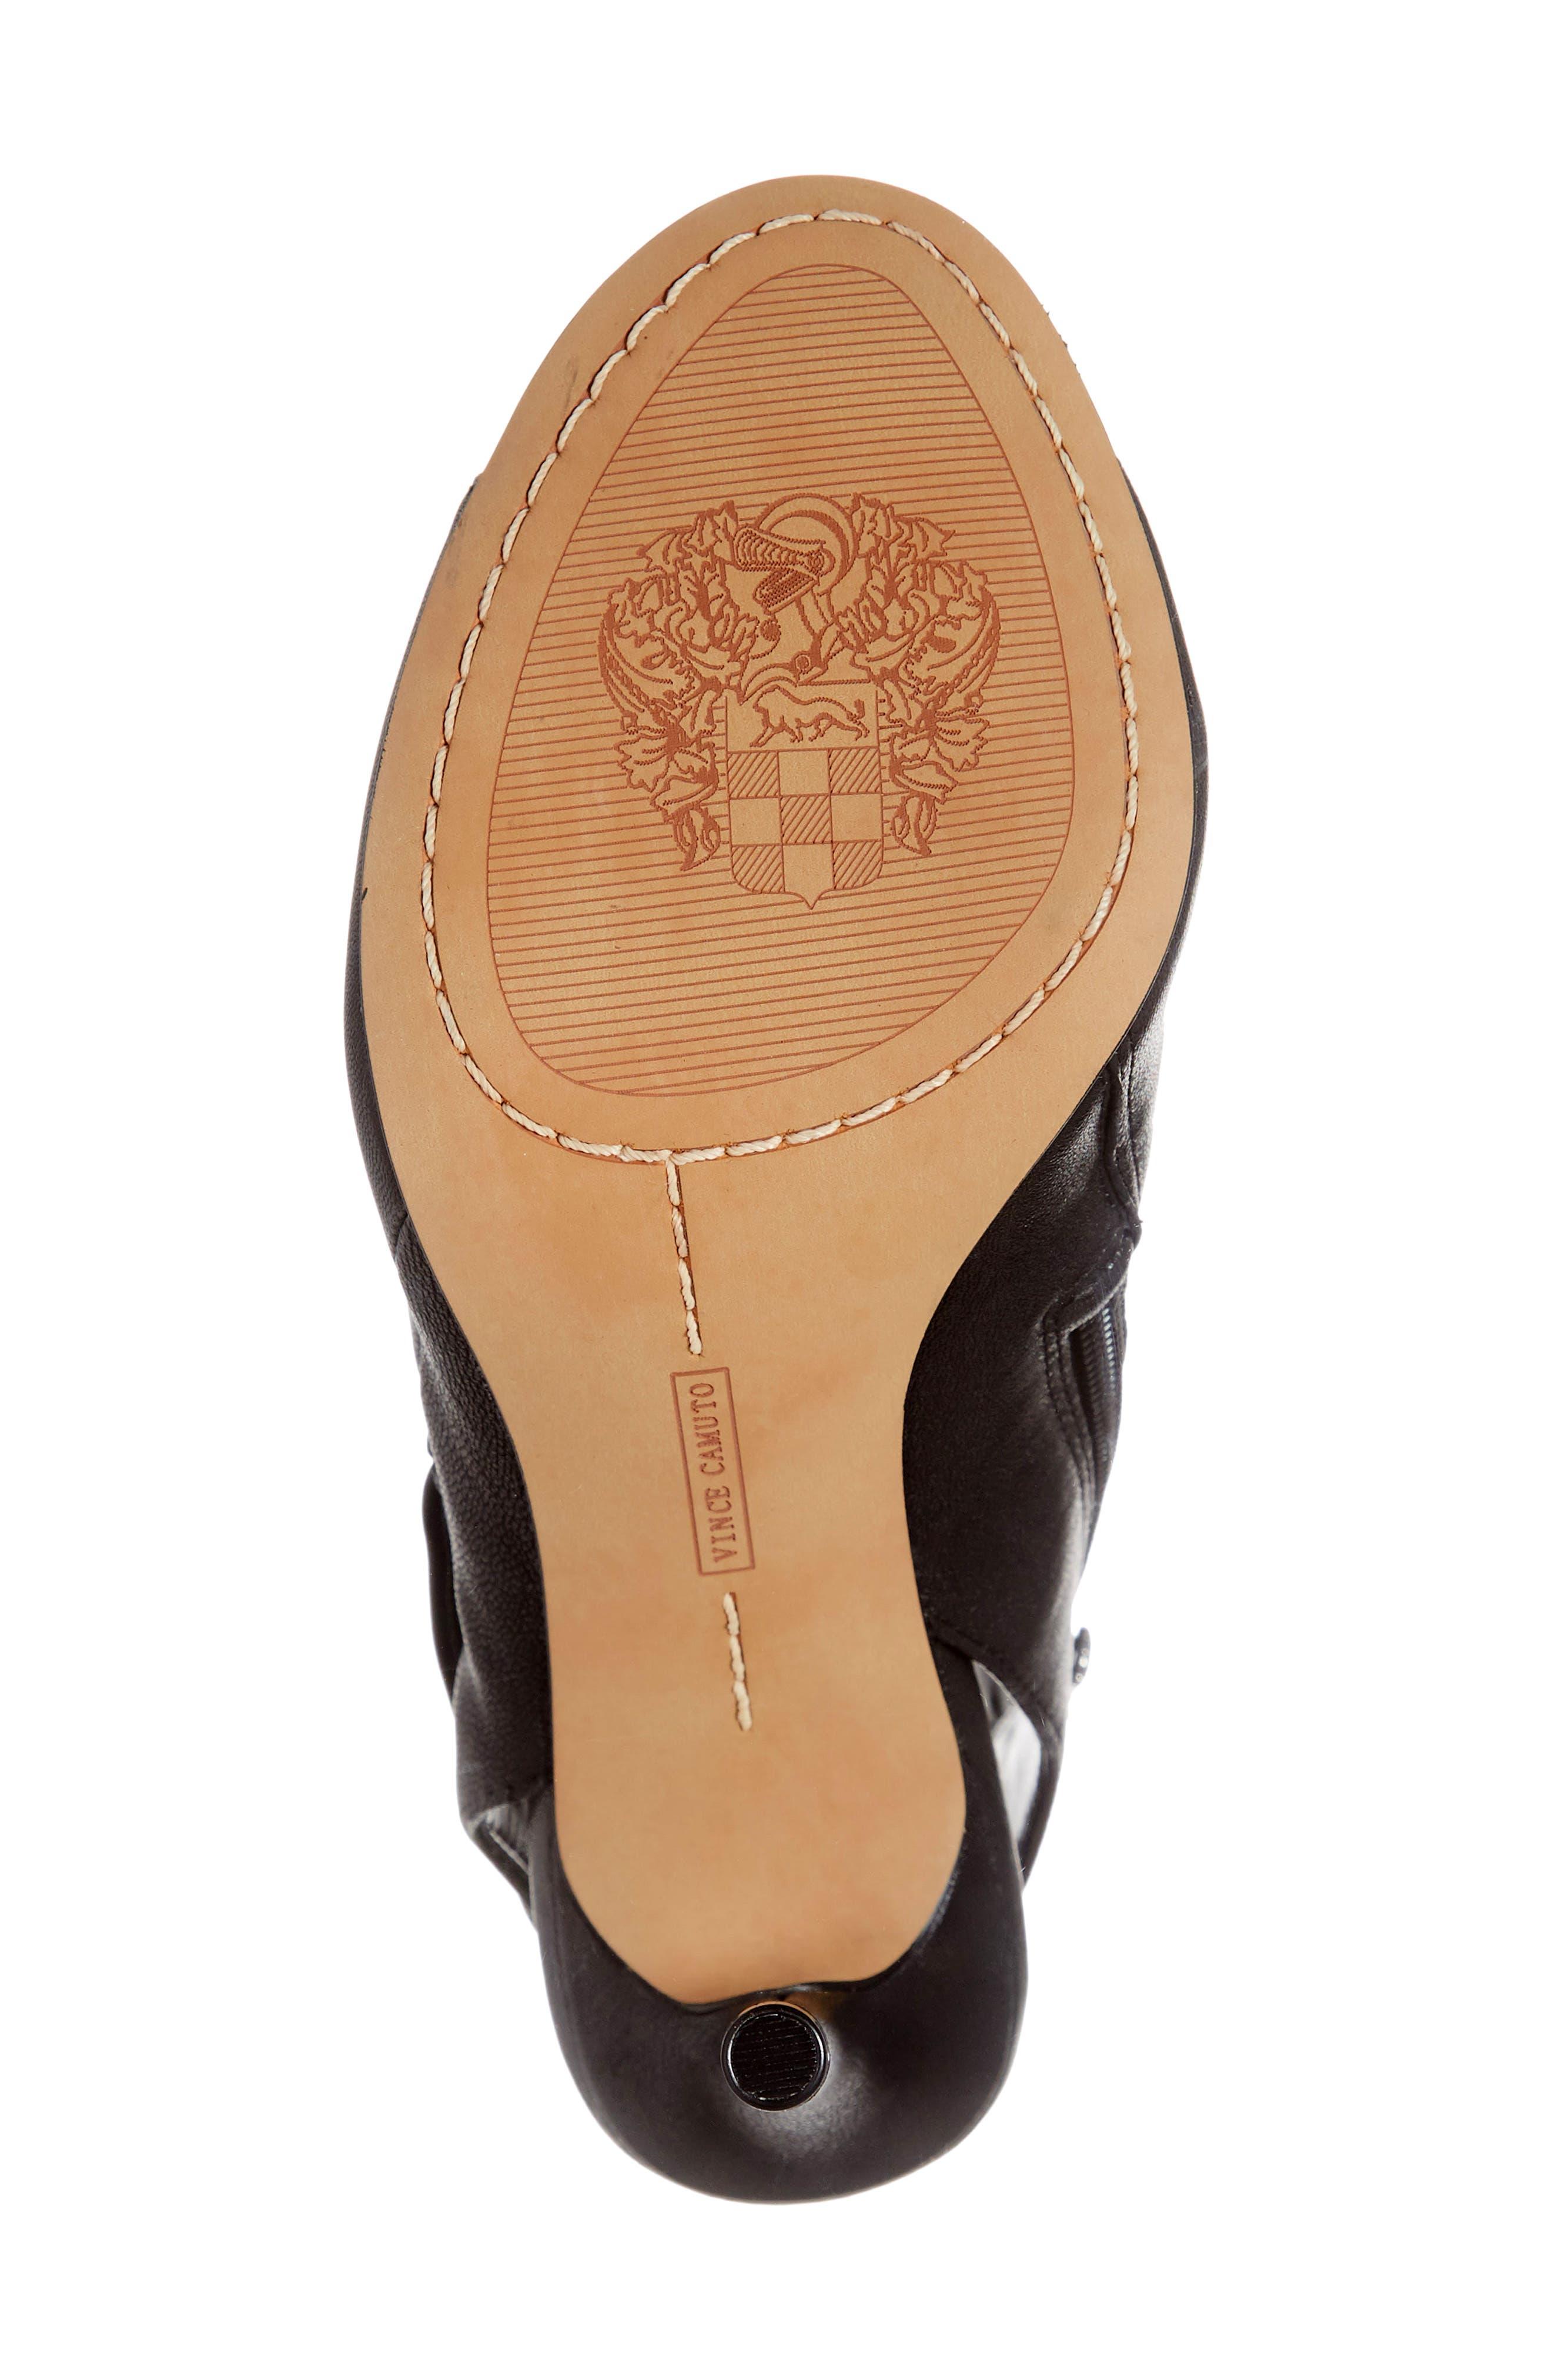 Cholia Asymmetrical Sandal Bootie,                             Alternate thumbnail 6, color,                             BLACK LEATHER